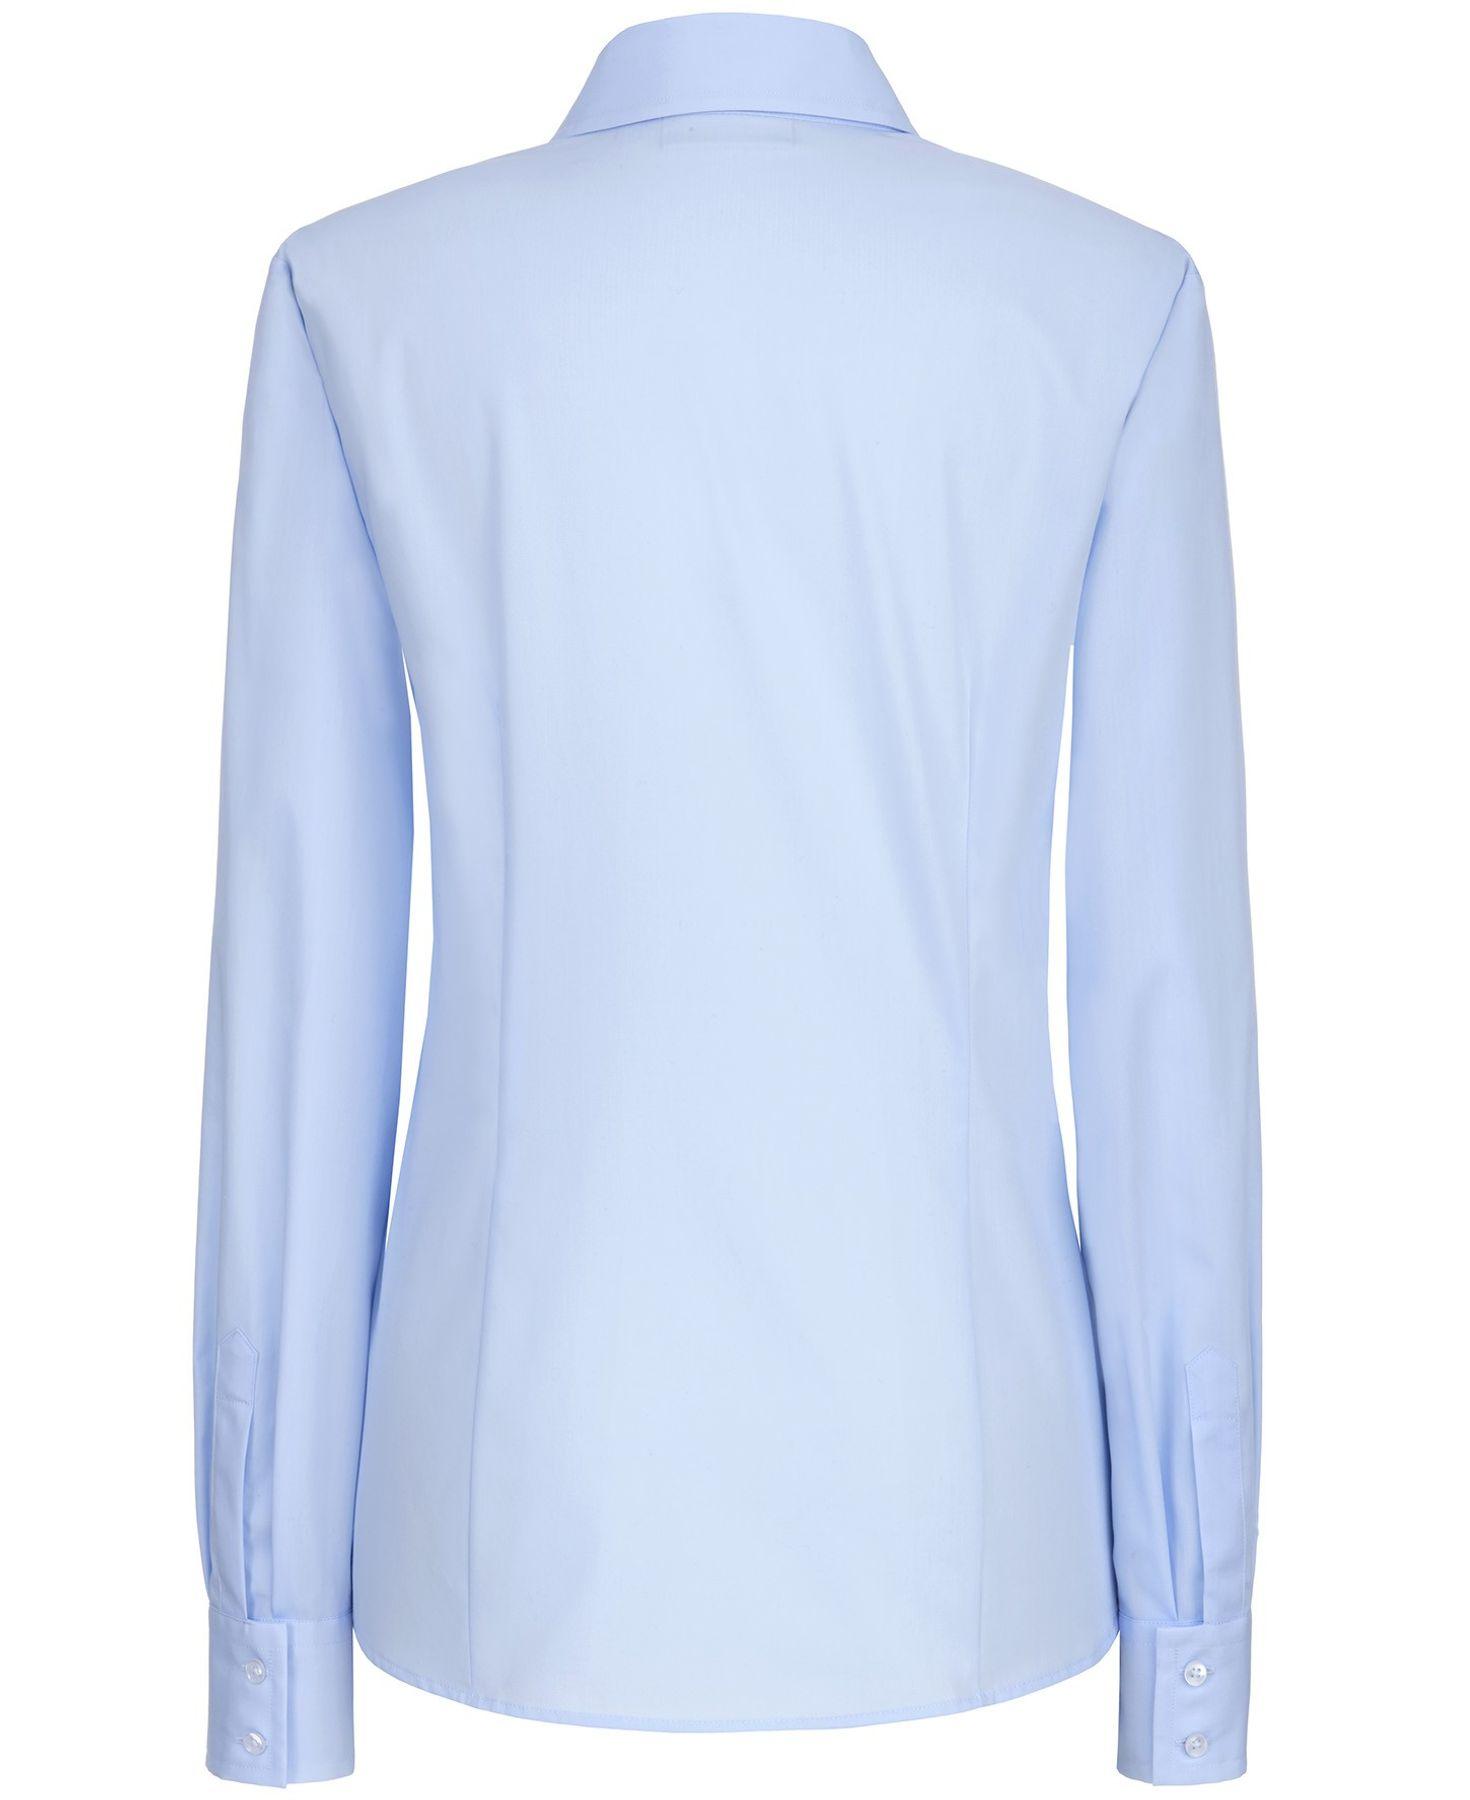 Eterna -  Comfort-Fit - Damen Langarm Bluse in Hellblau kariert  (5330 D661) – Bild 7